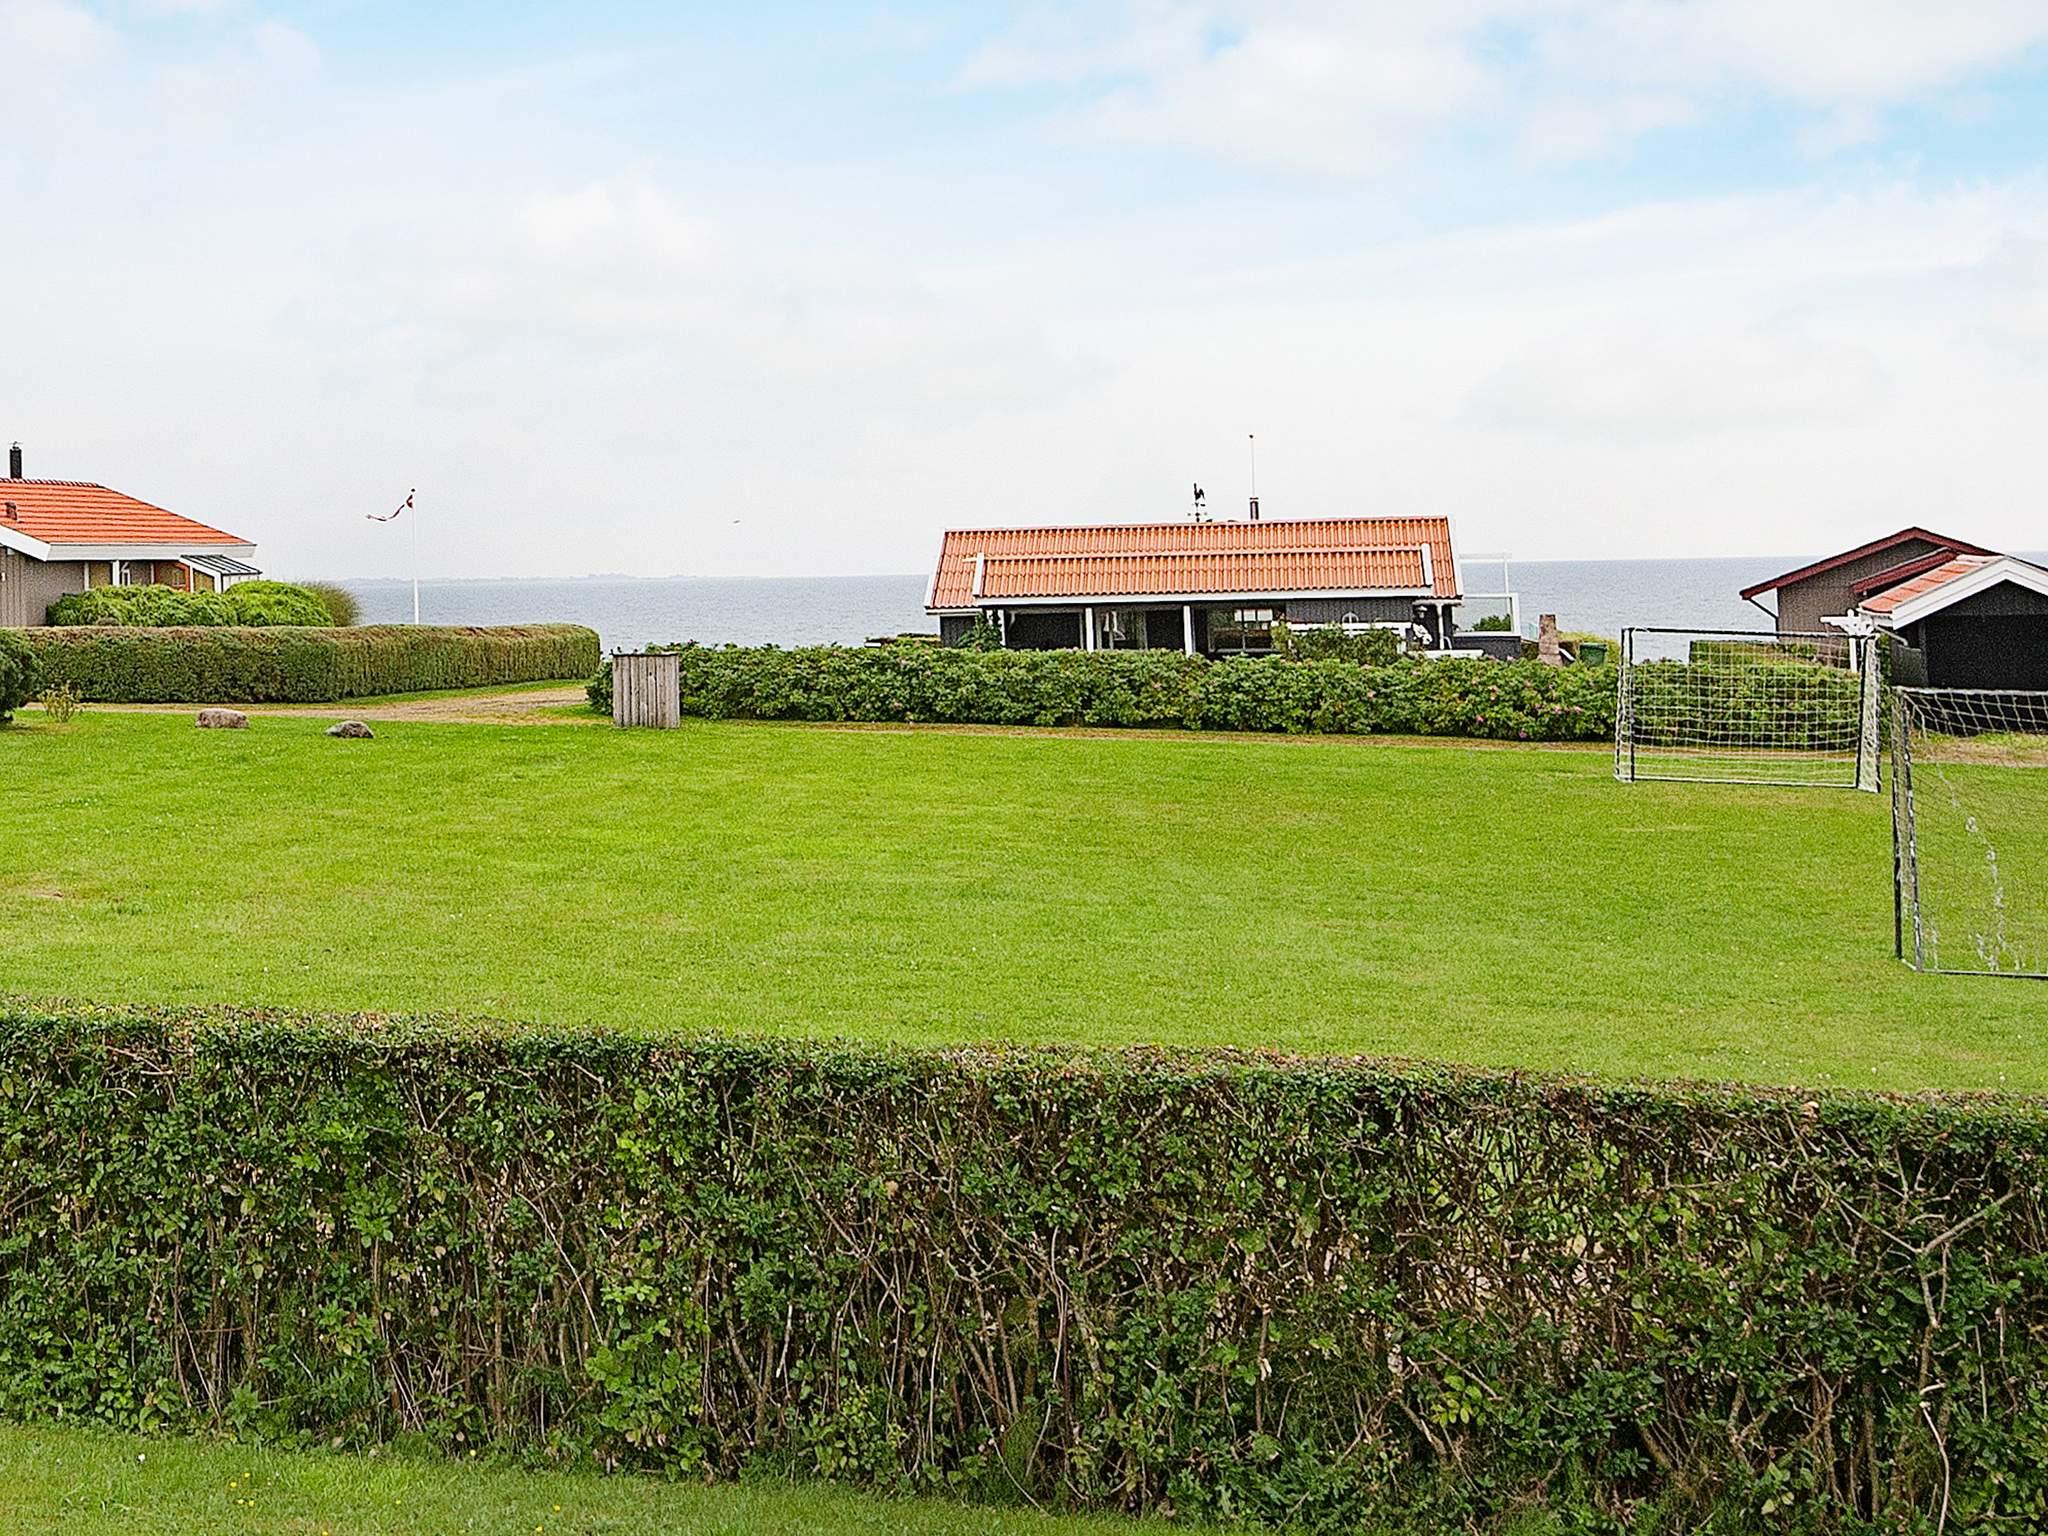 Ferienhaus As Vig (87848), Juelsminde, , Ostjütland, Dänemark, Bild 21